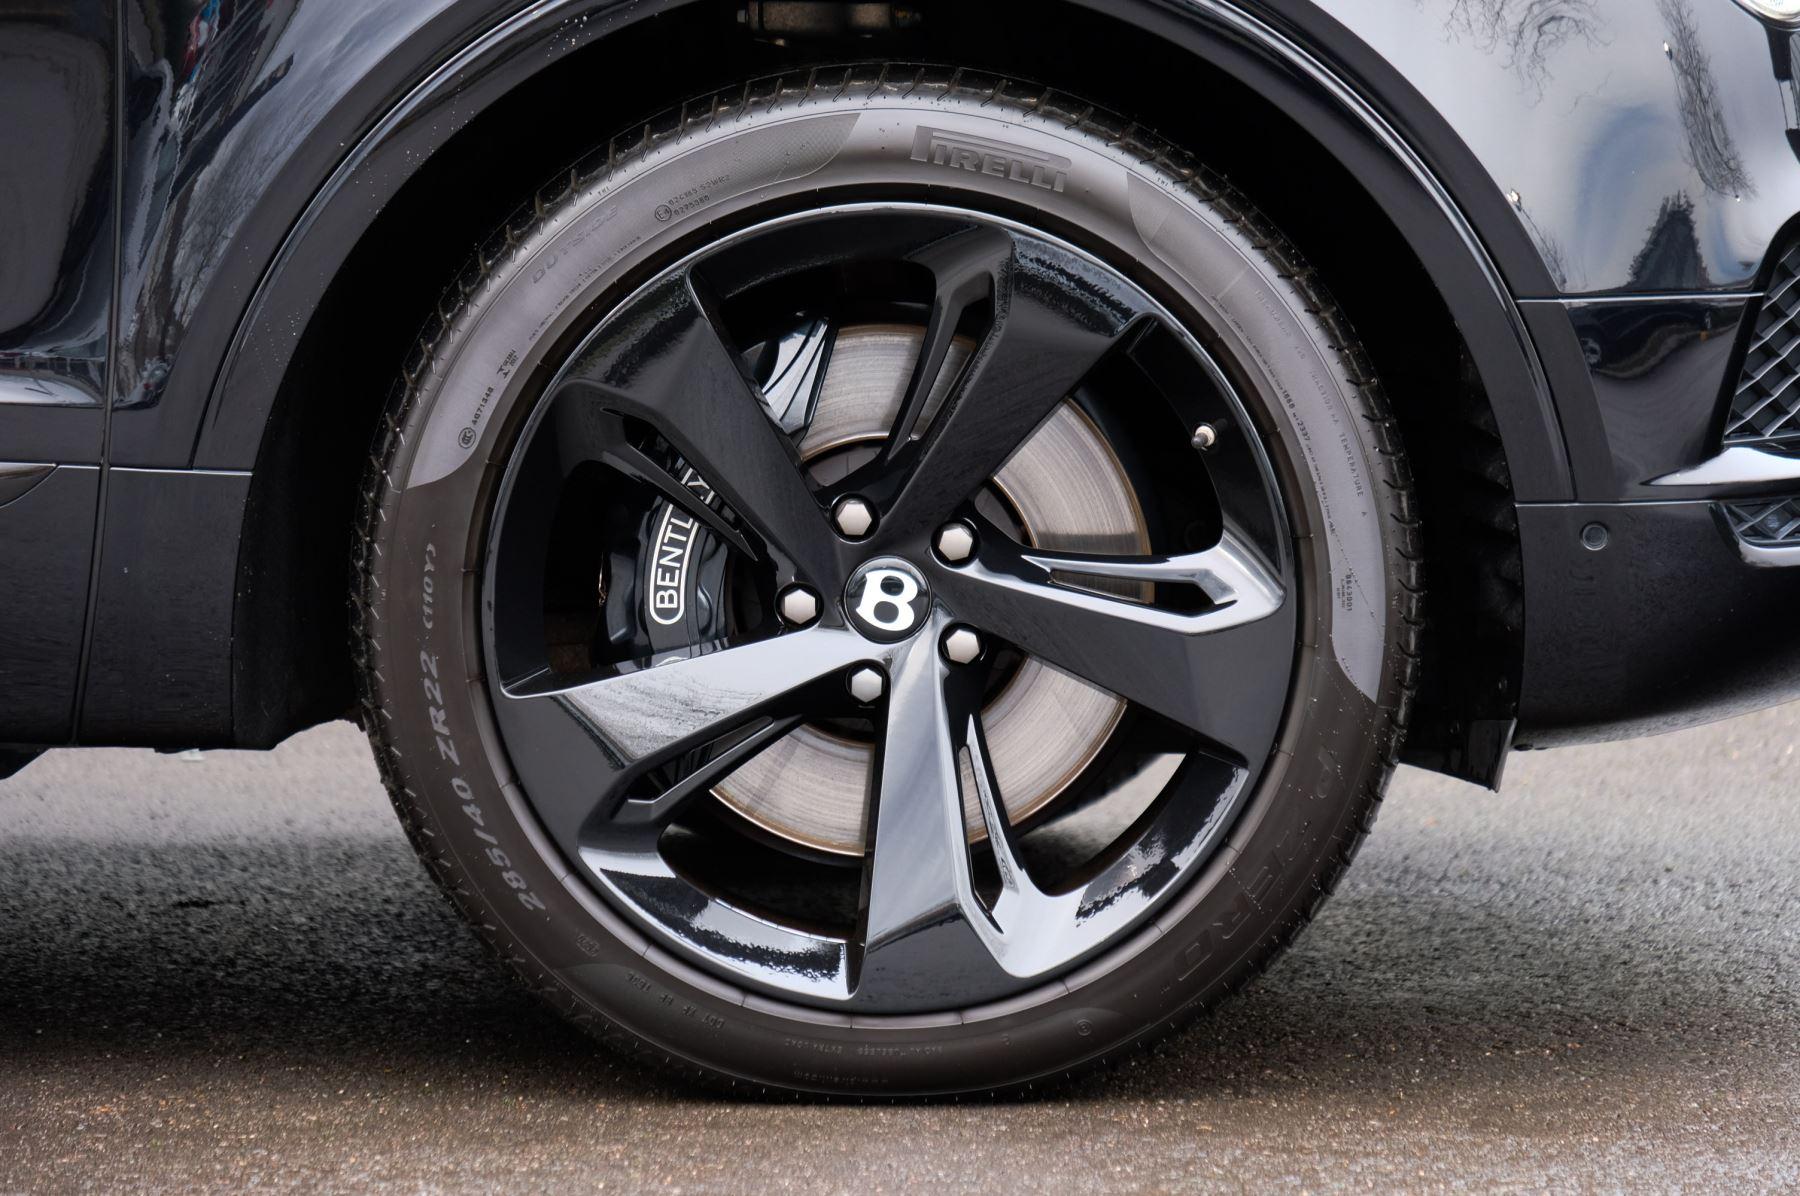 Bentley Bentayga 6.0 W12 5dr - Mulliner Driving Specification  image 6